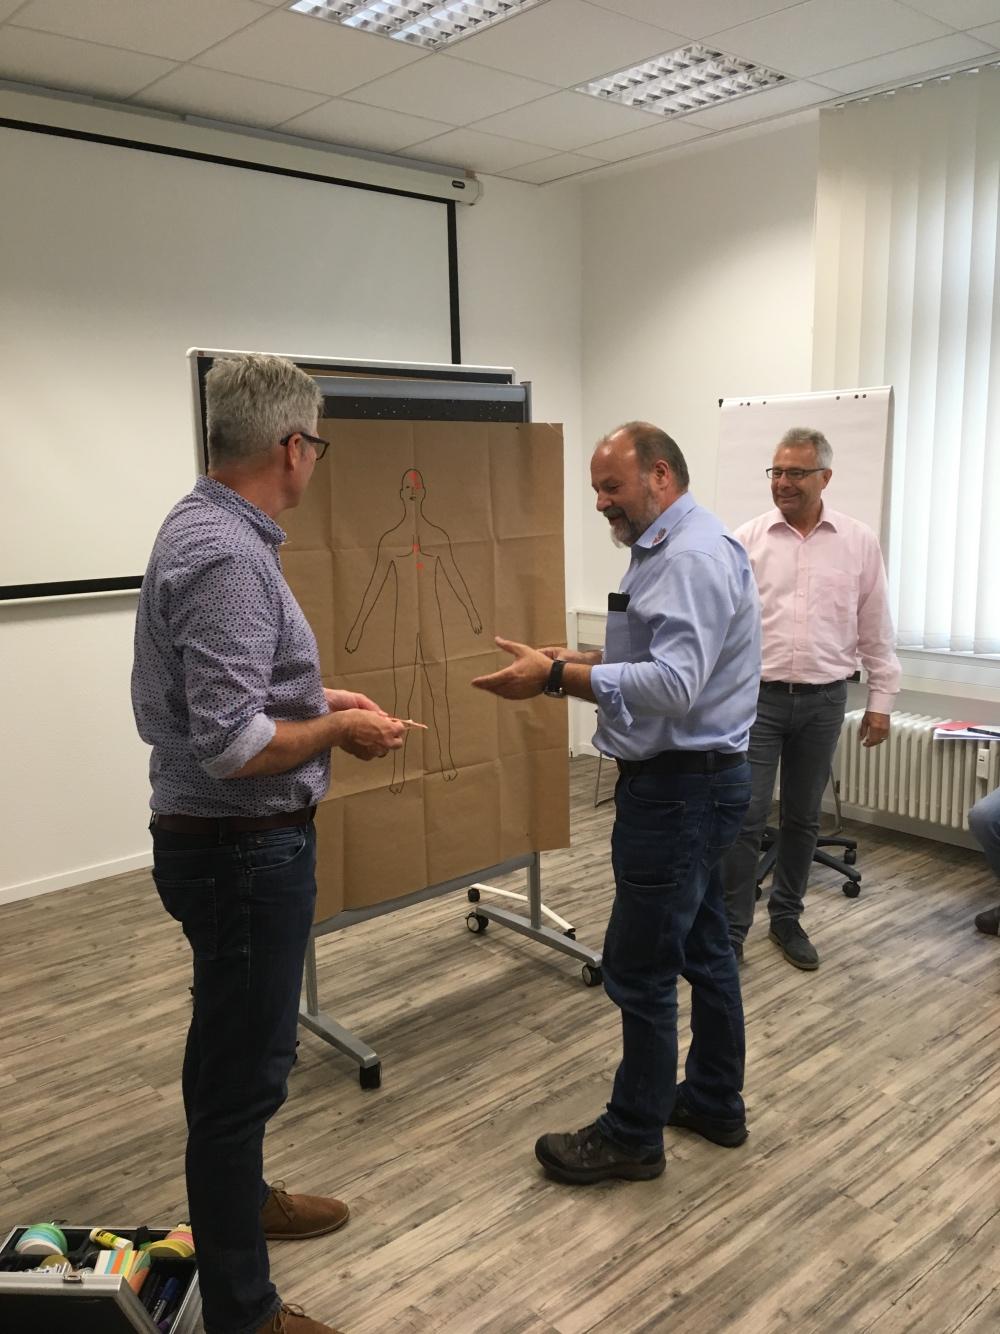 STRUCTOGRAM® Trainings-System Kassel mit Föbus Kassel